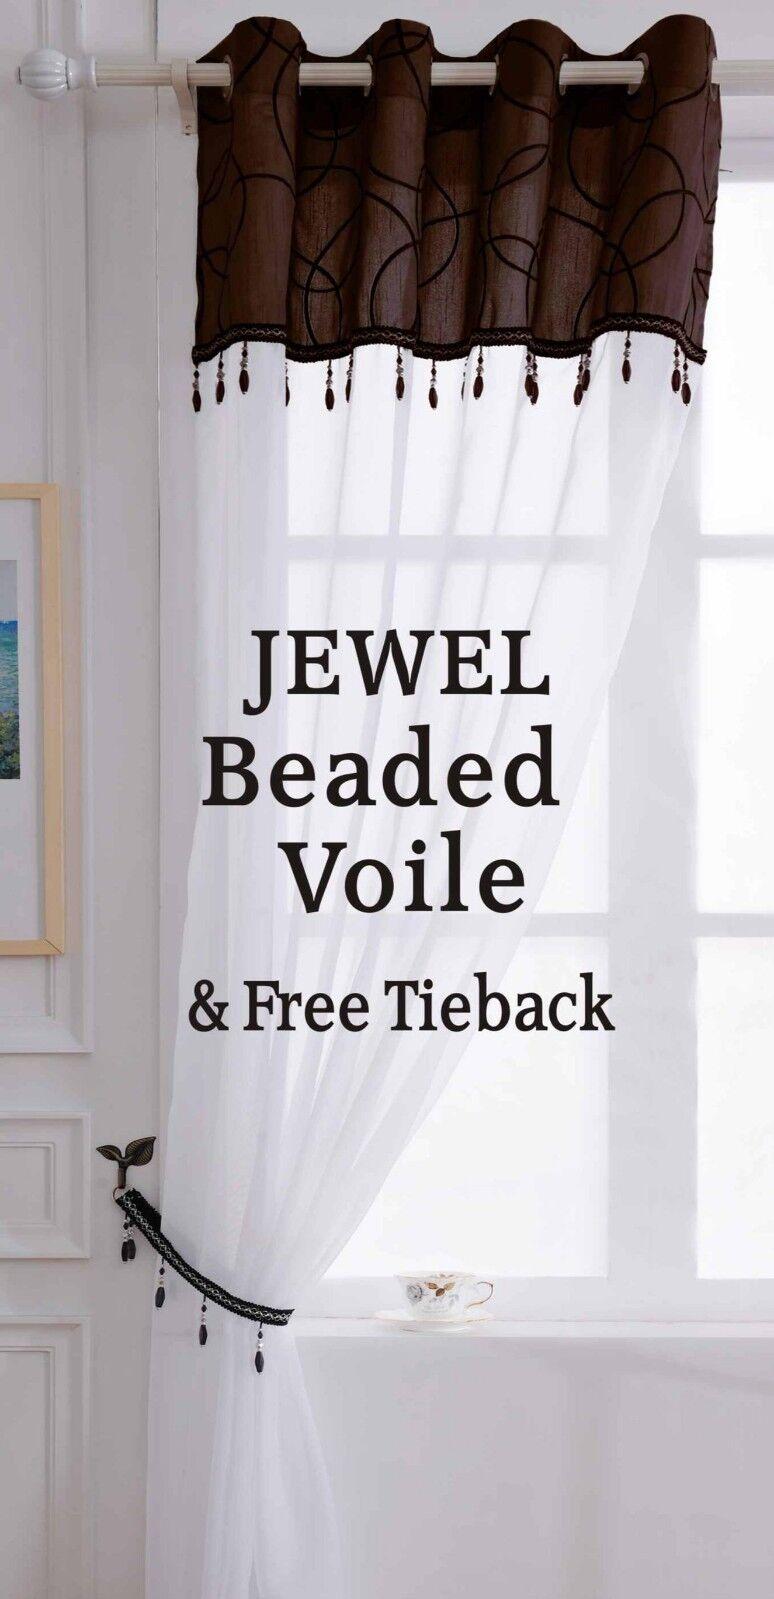 Clearance Jewel Tassel Beaded Eyelet Voile Curtain Panel